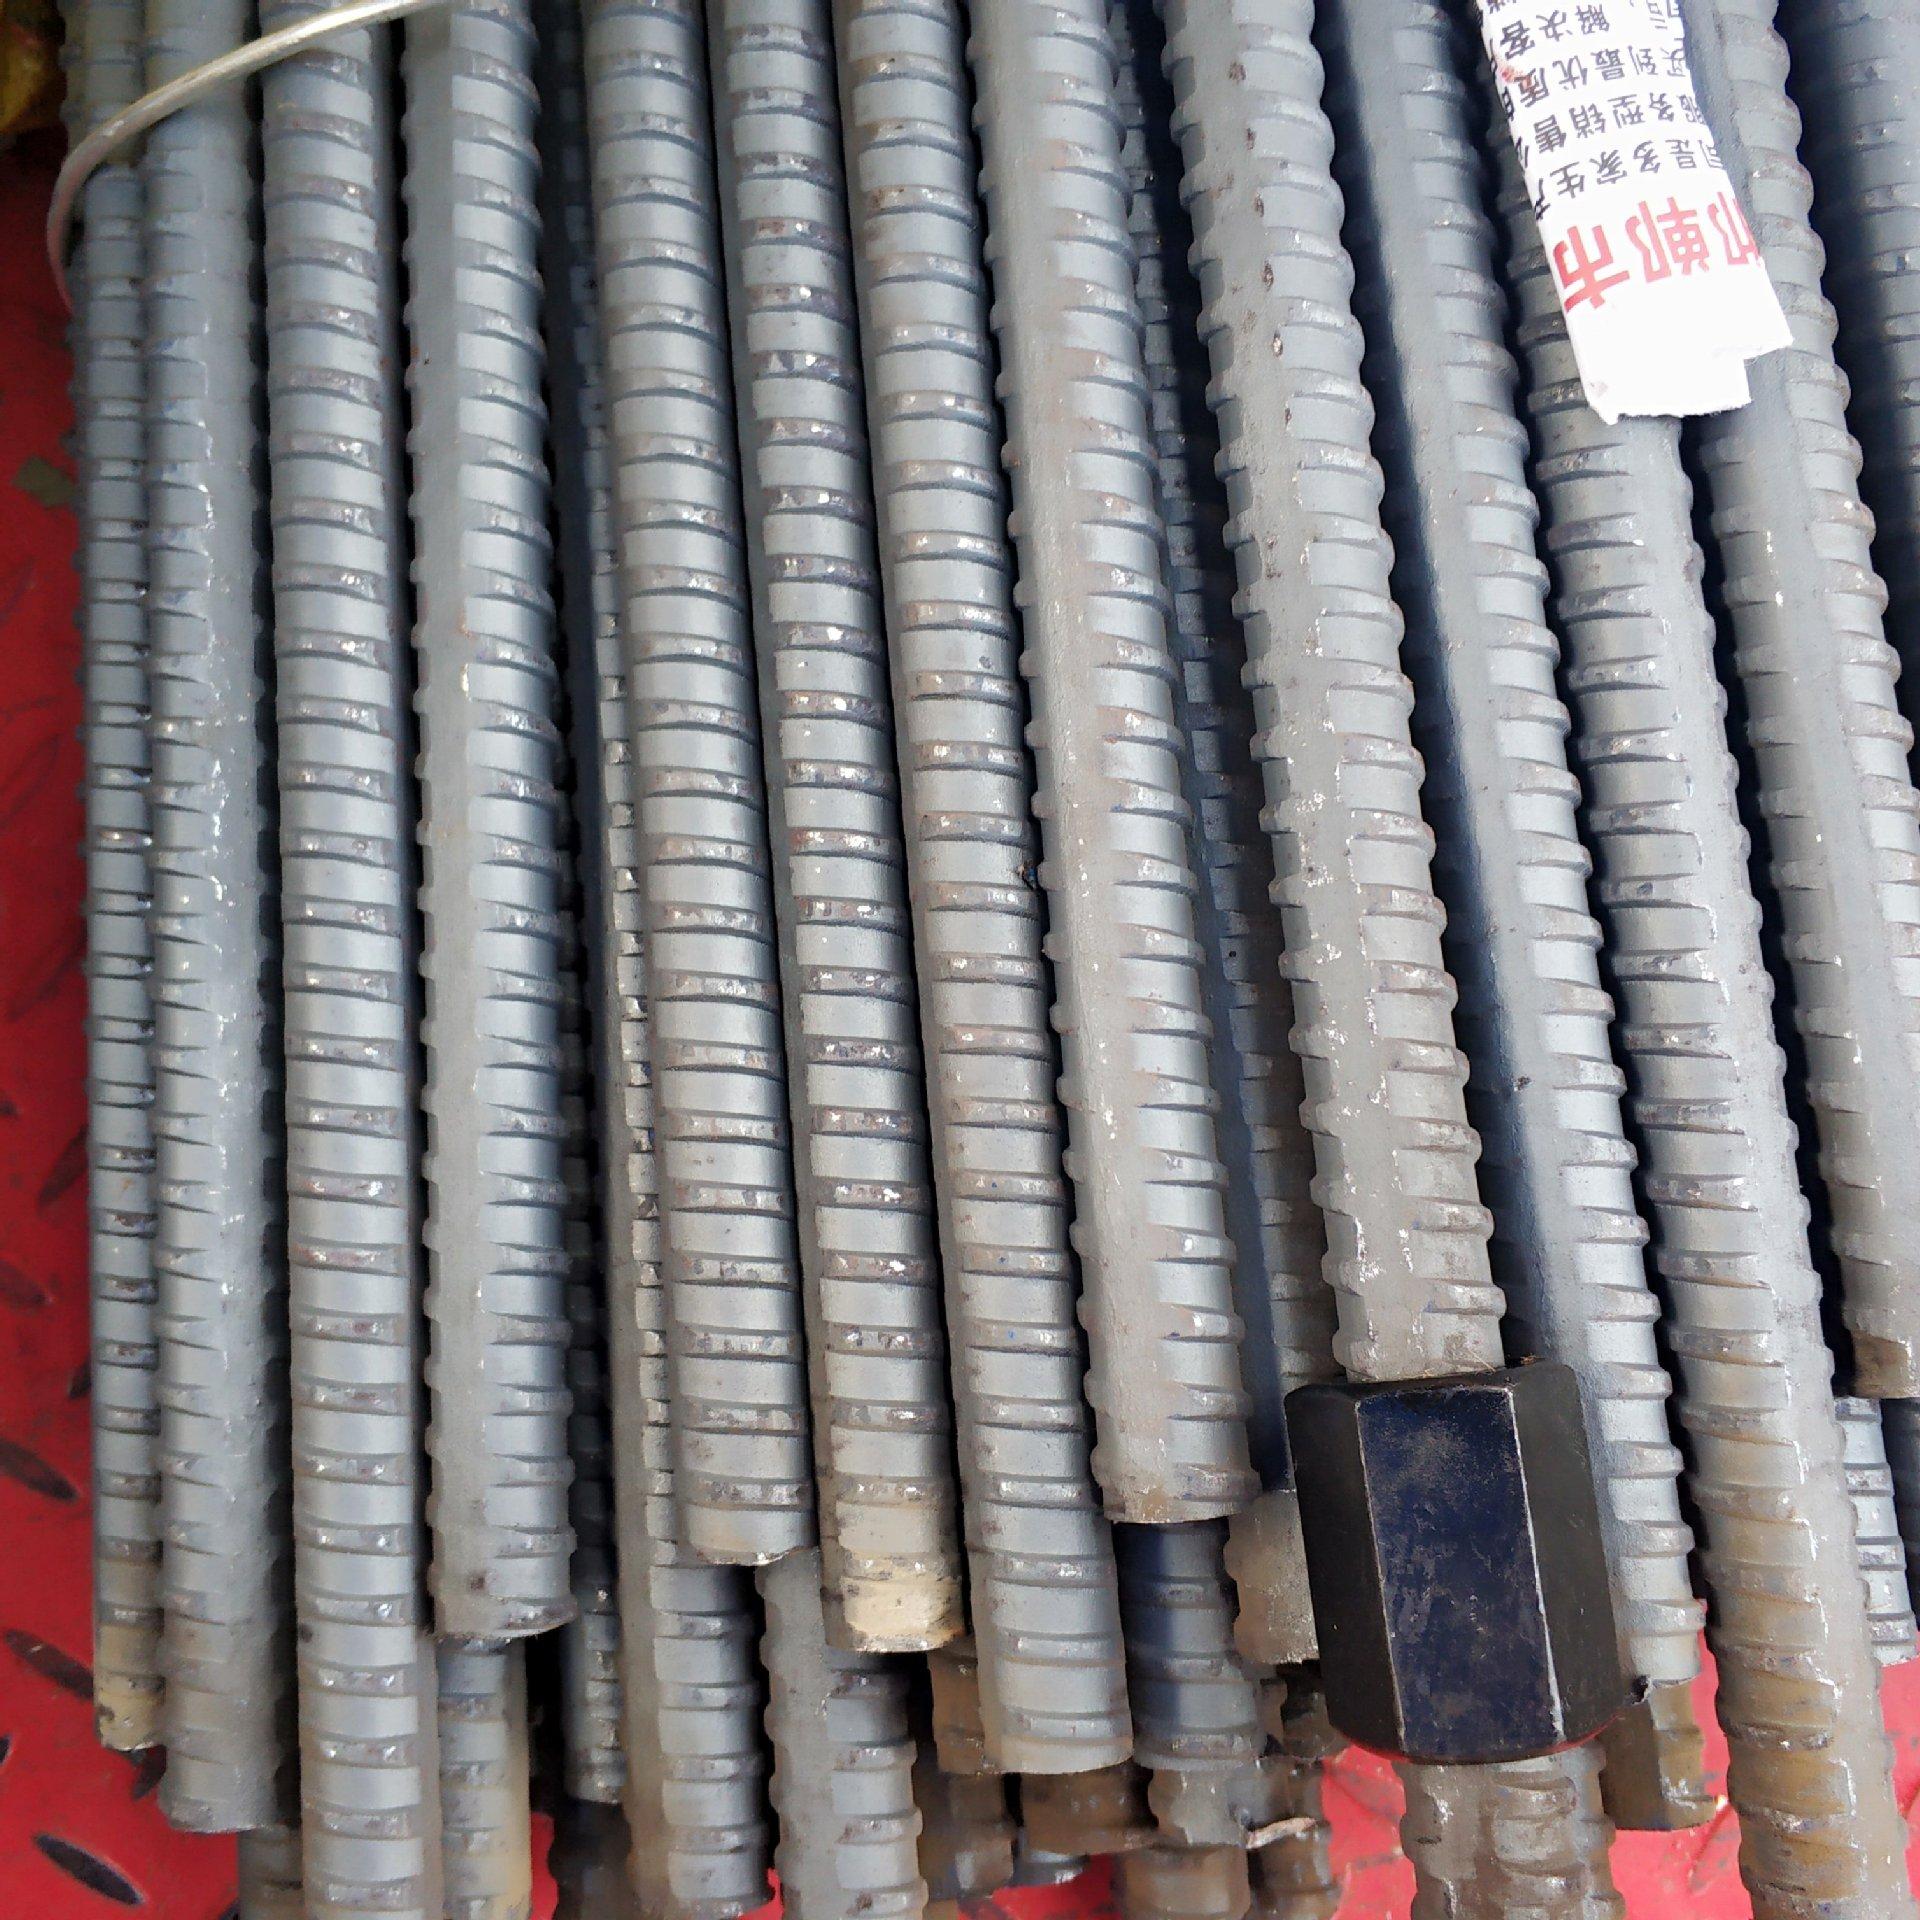 HRB400 rebar/HRB400 finishing rolled rebar/rebar nut/square washer